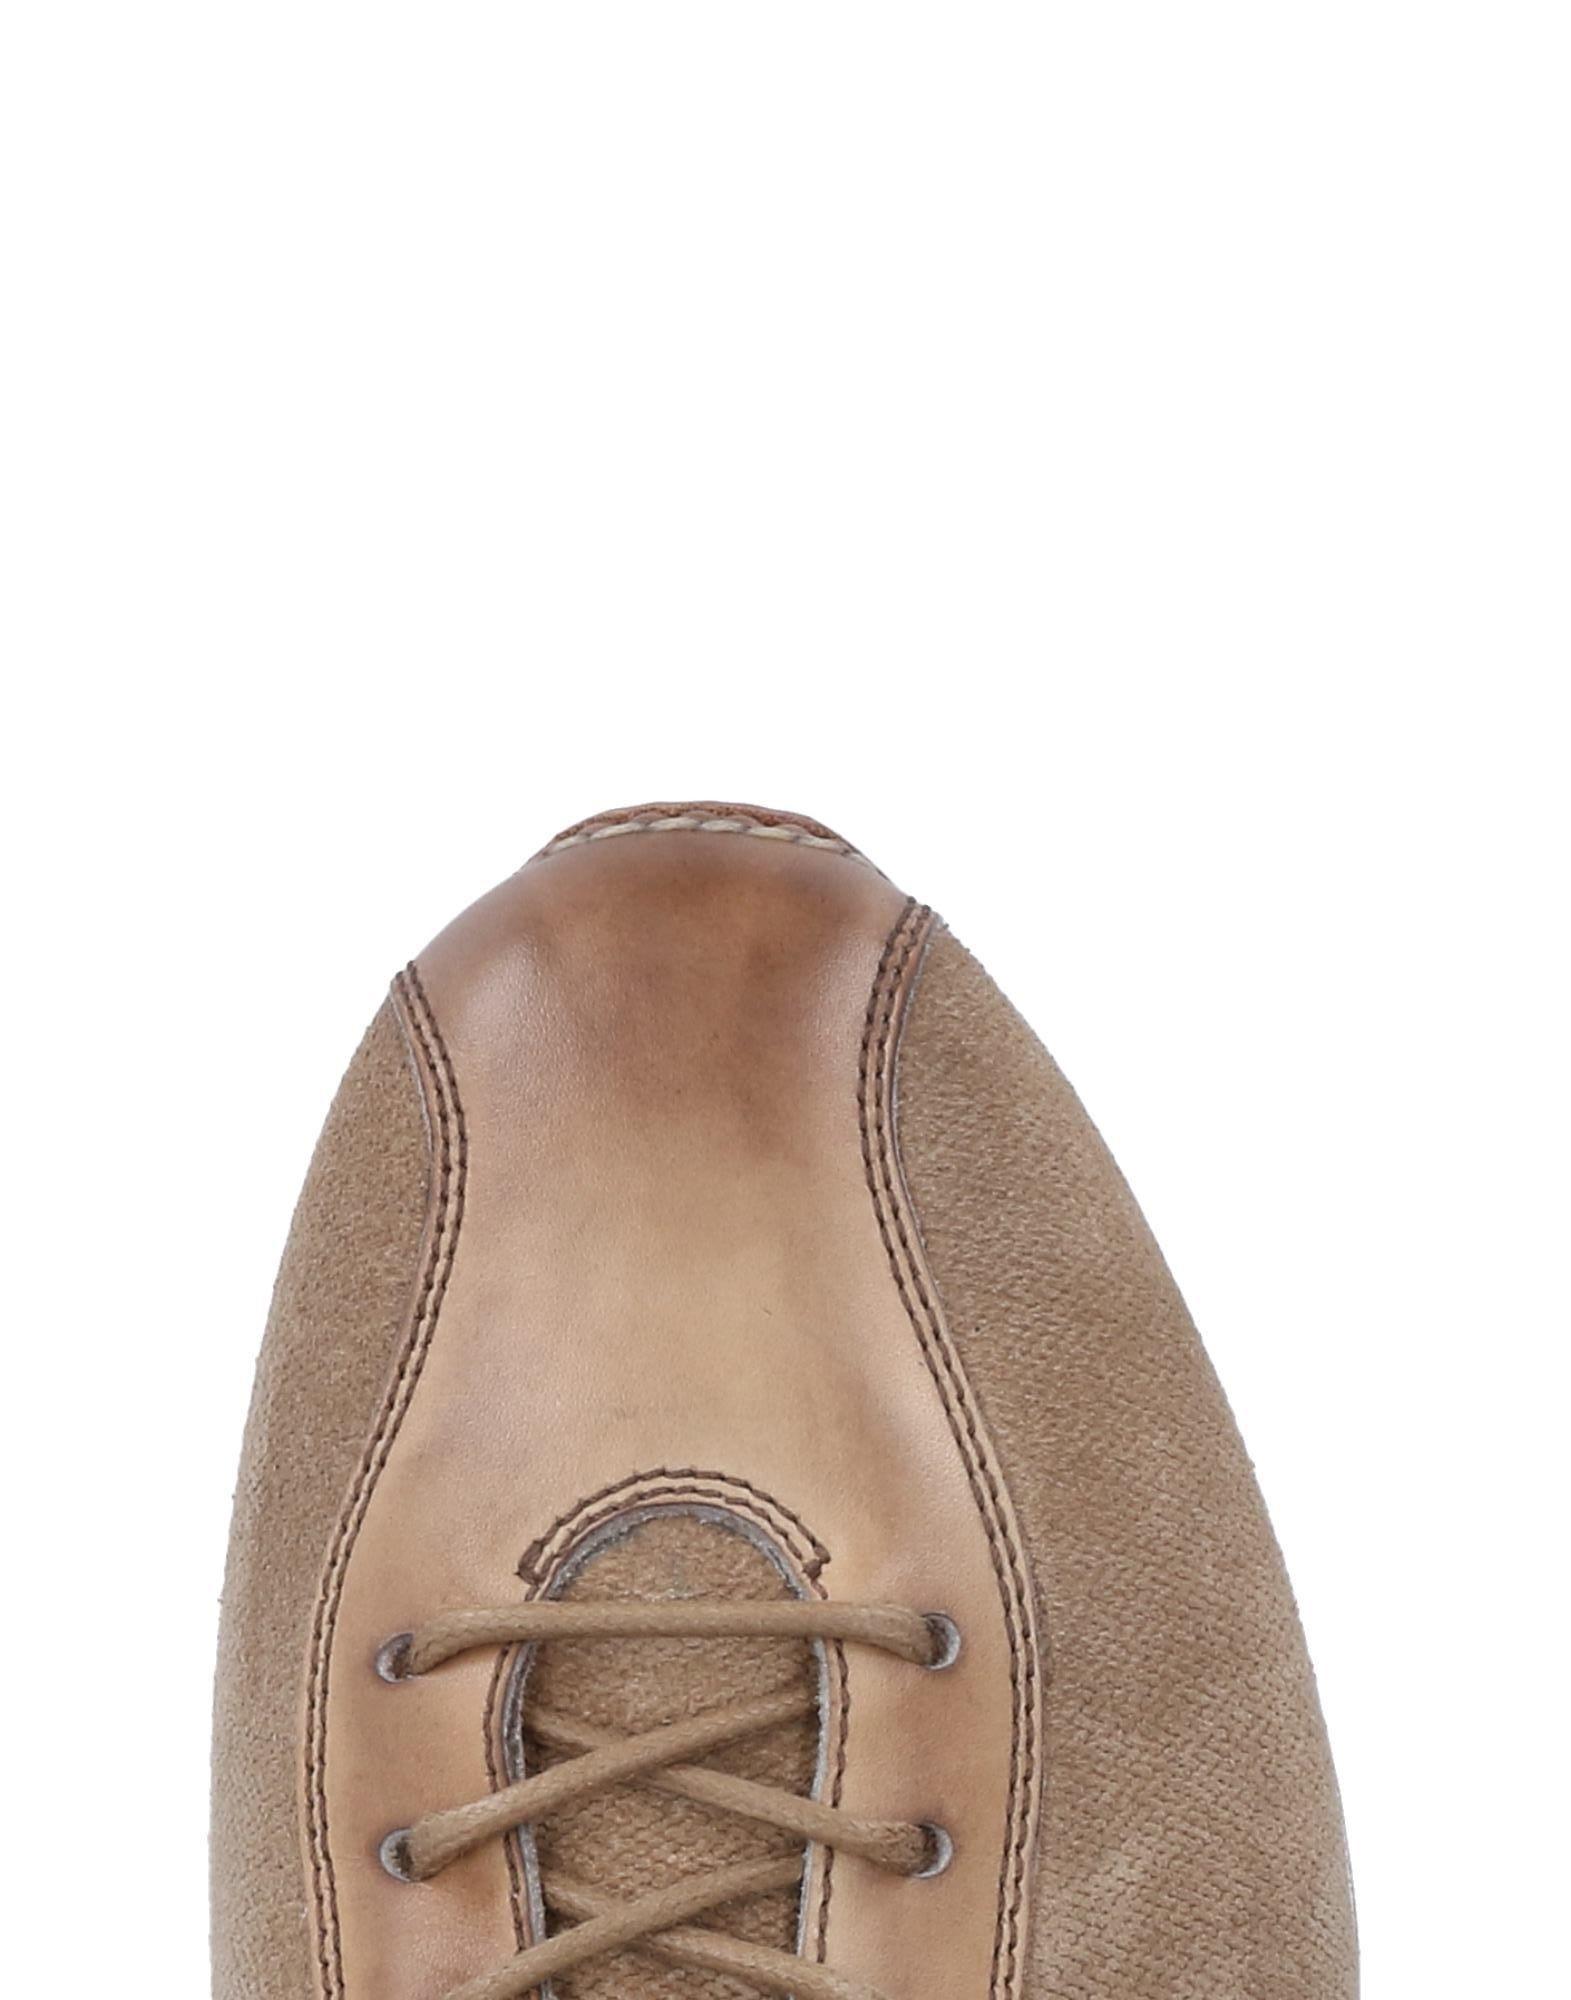 Santoni Sneakers Herren  beliebte 11520741VC Gute Qualität beliebte  Schuhe bdb8e6